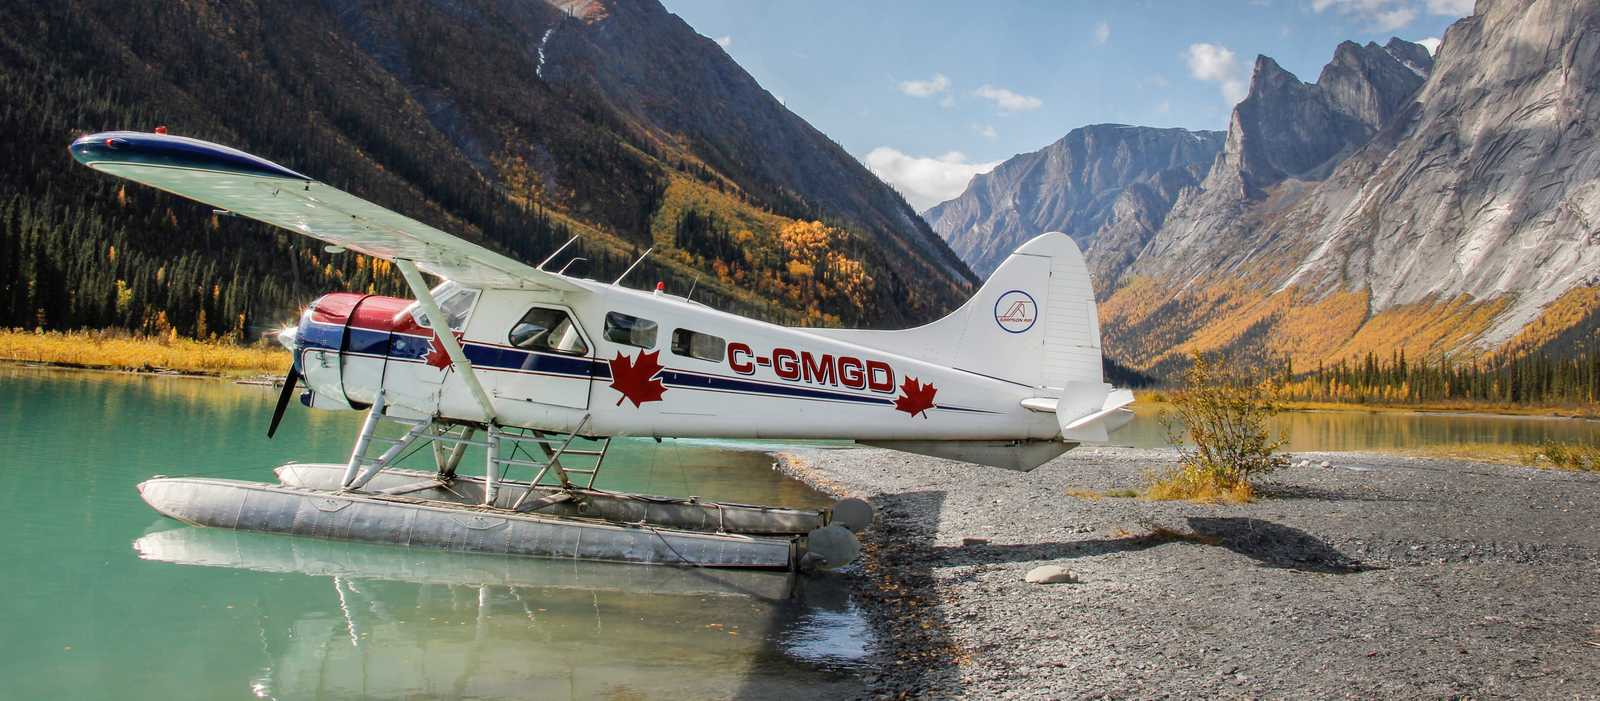 Glacier Lake im Nahannni National Park